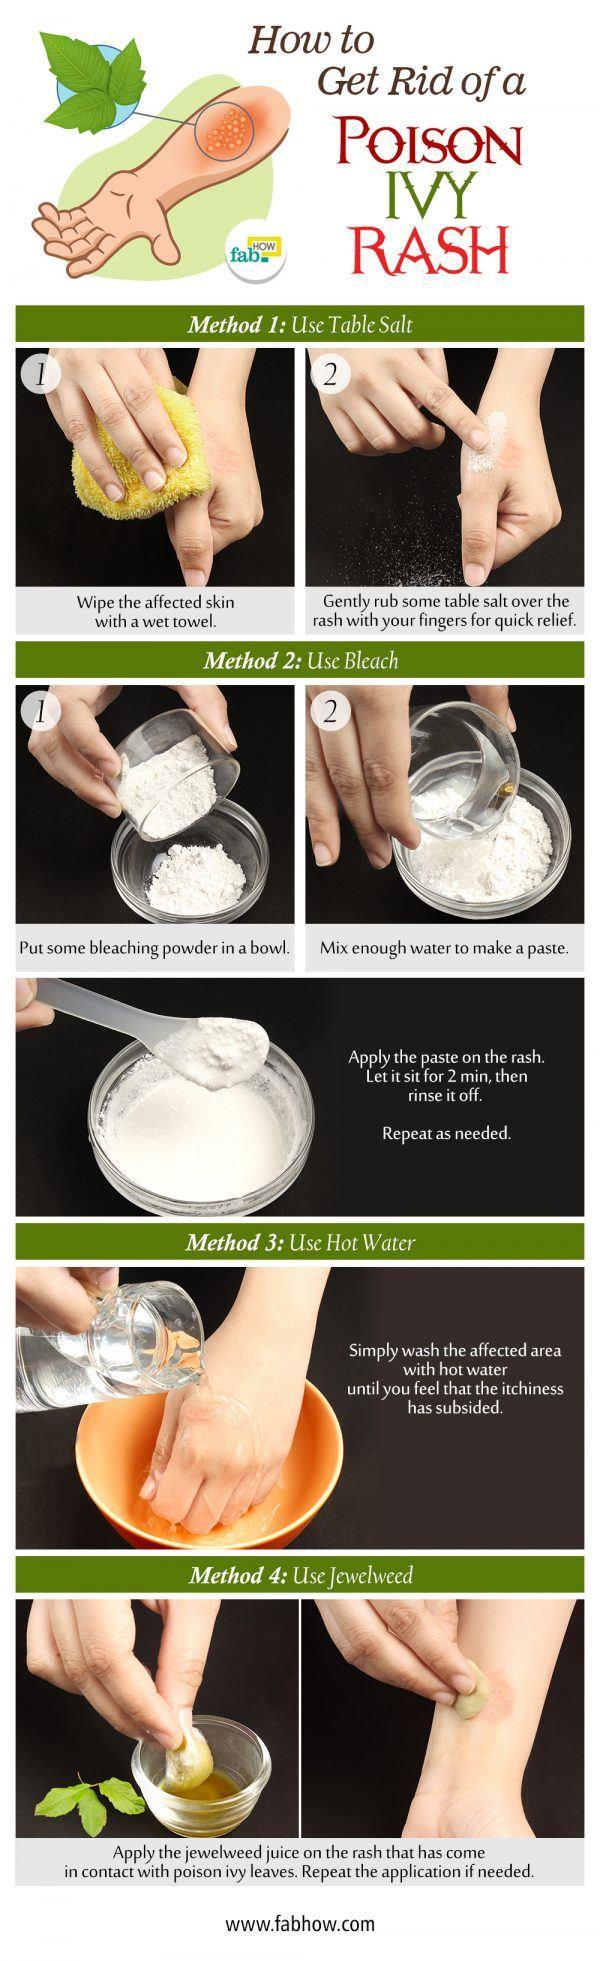 get rid of posion ivy rash